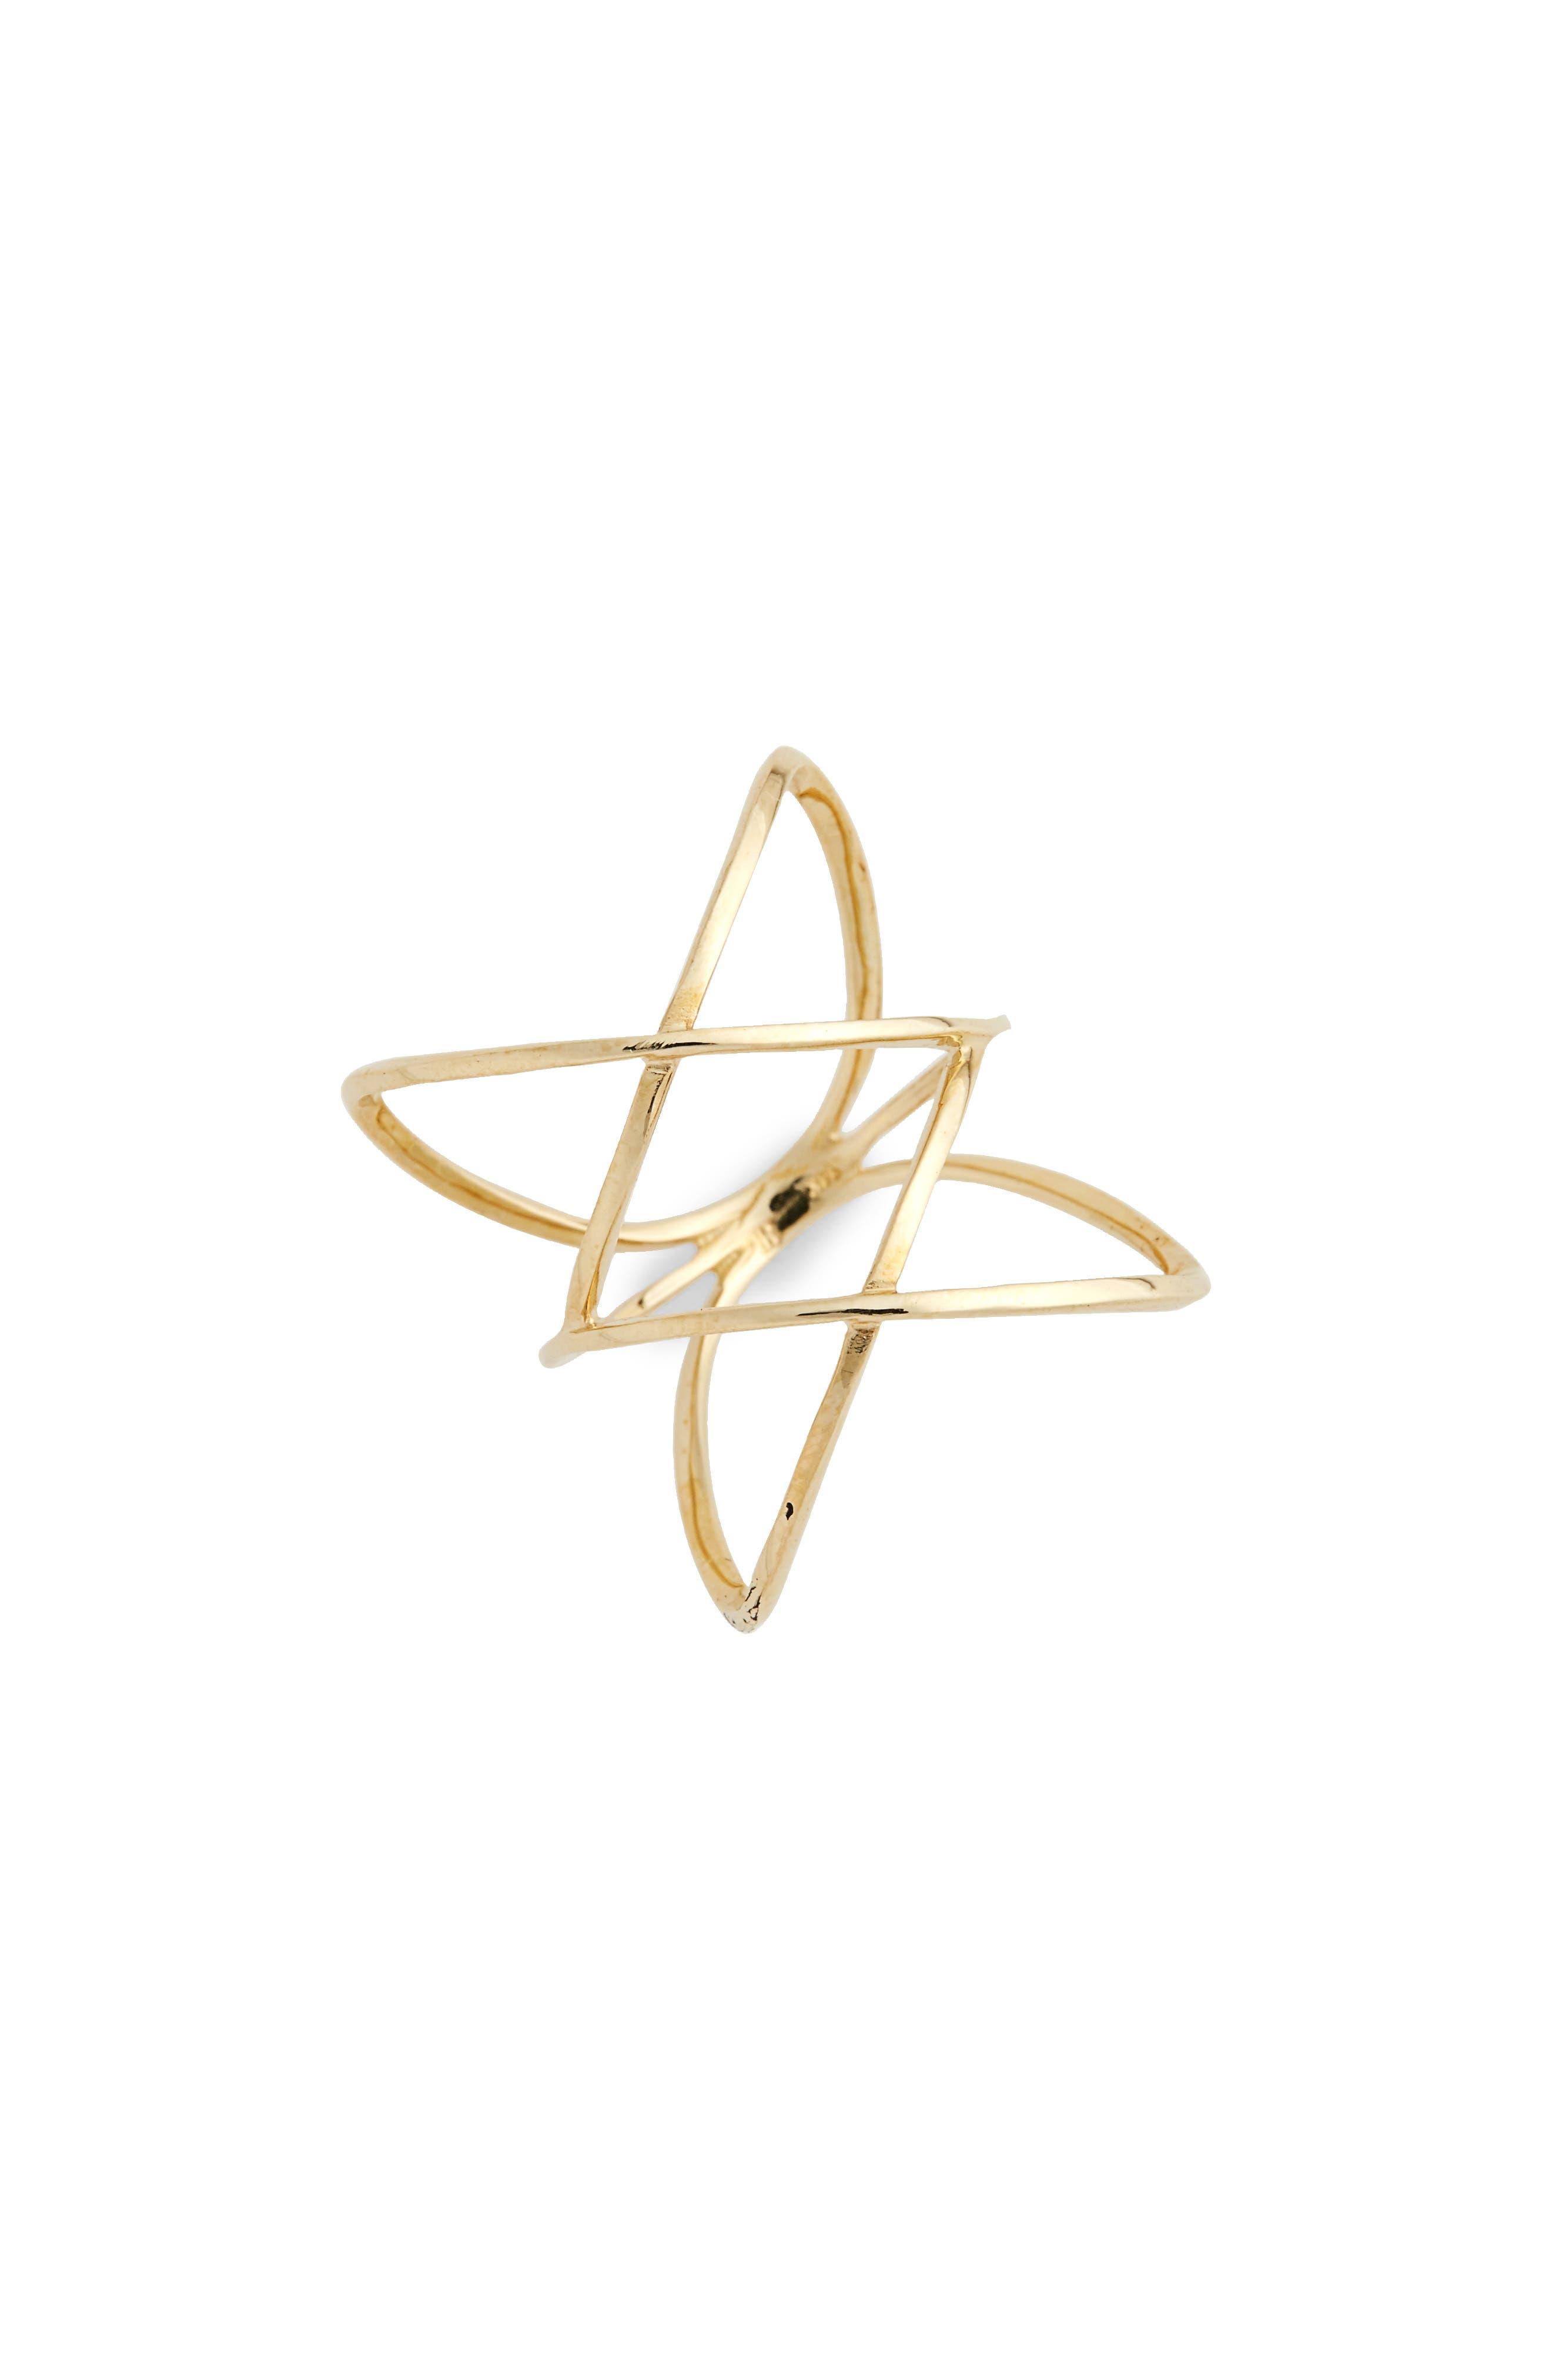 14KT Double Crisscross Ring,                             Alternate thumbnail 2, color,                             YELLOW GOLD